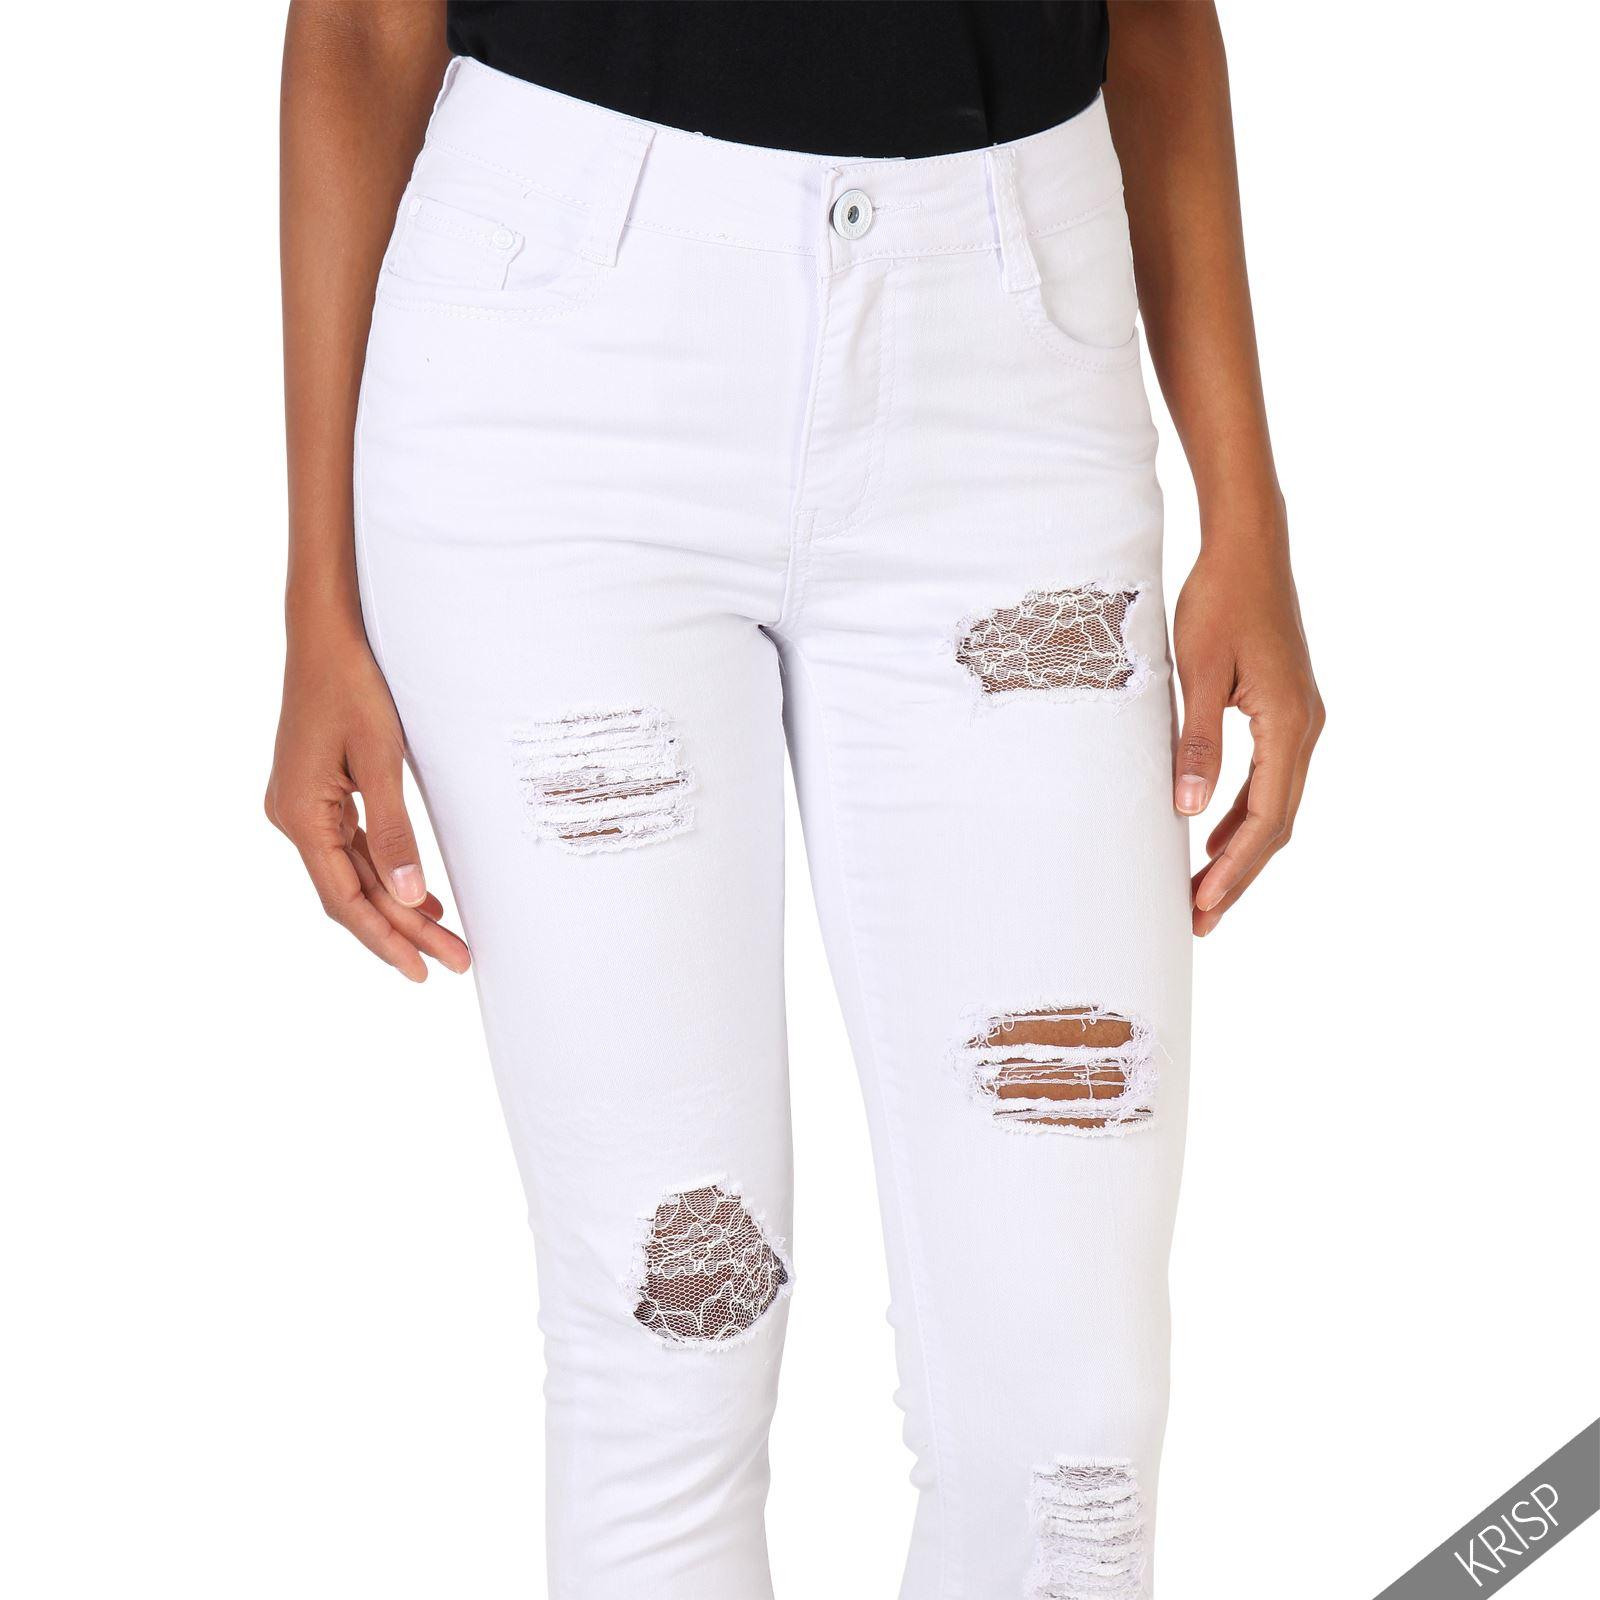 femme jean blanc taille haute trou empi cements dentelle. Black Bedroom Furniture Sets. Home Design Ideas